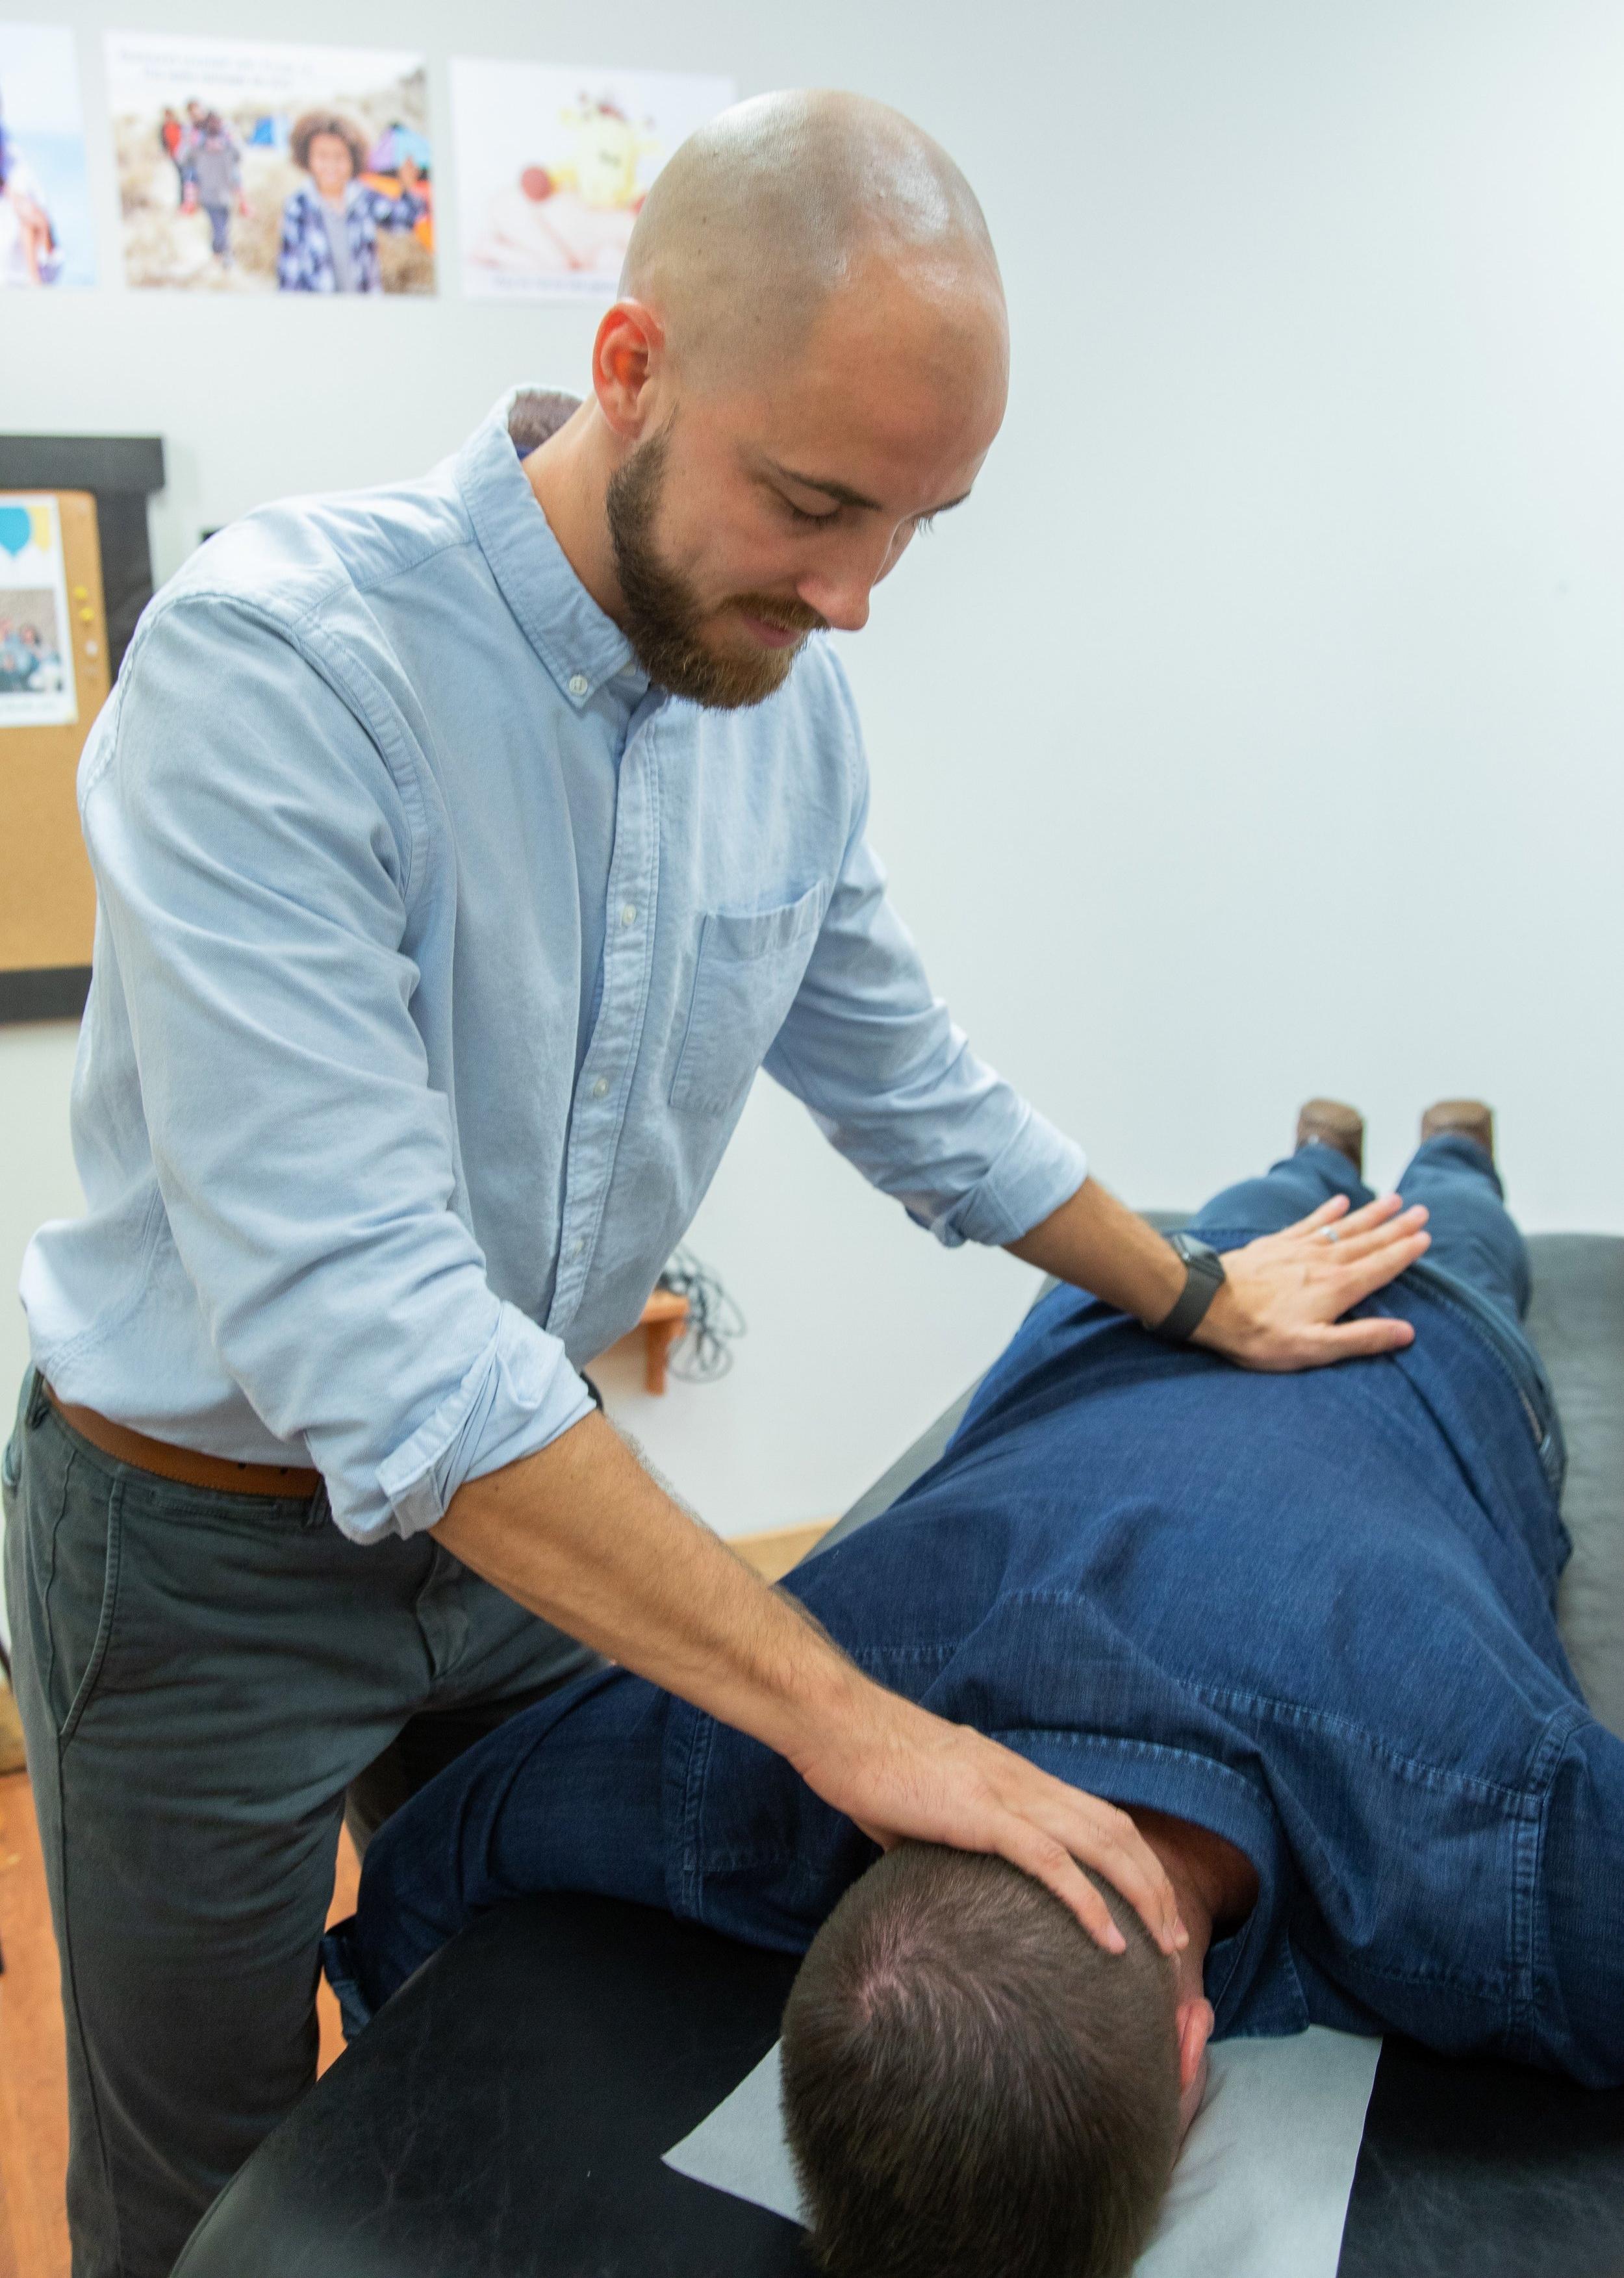 Restoration-Family-Chiropractic-chiropractor-adjustment-trt.jpg